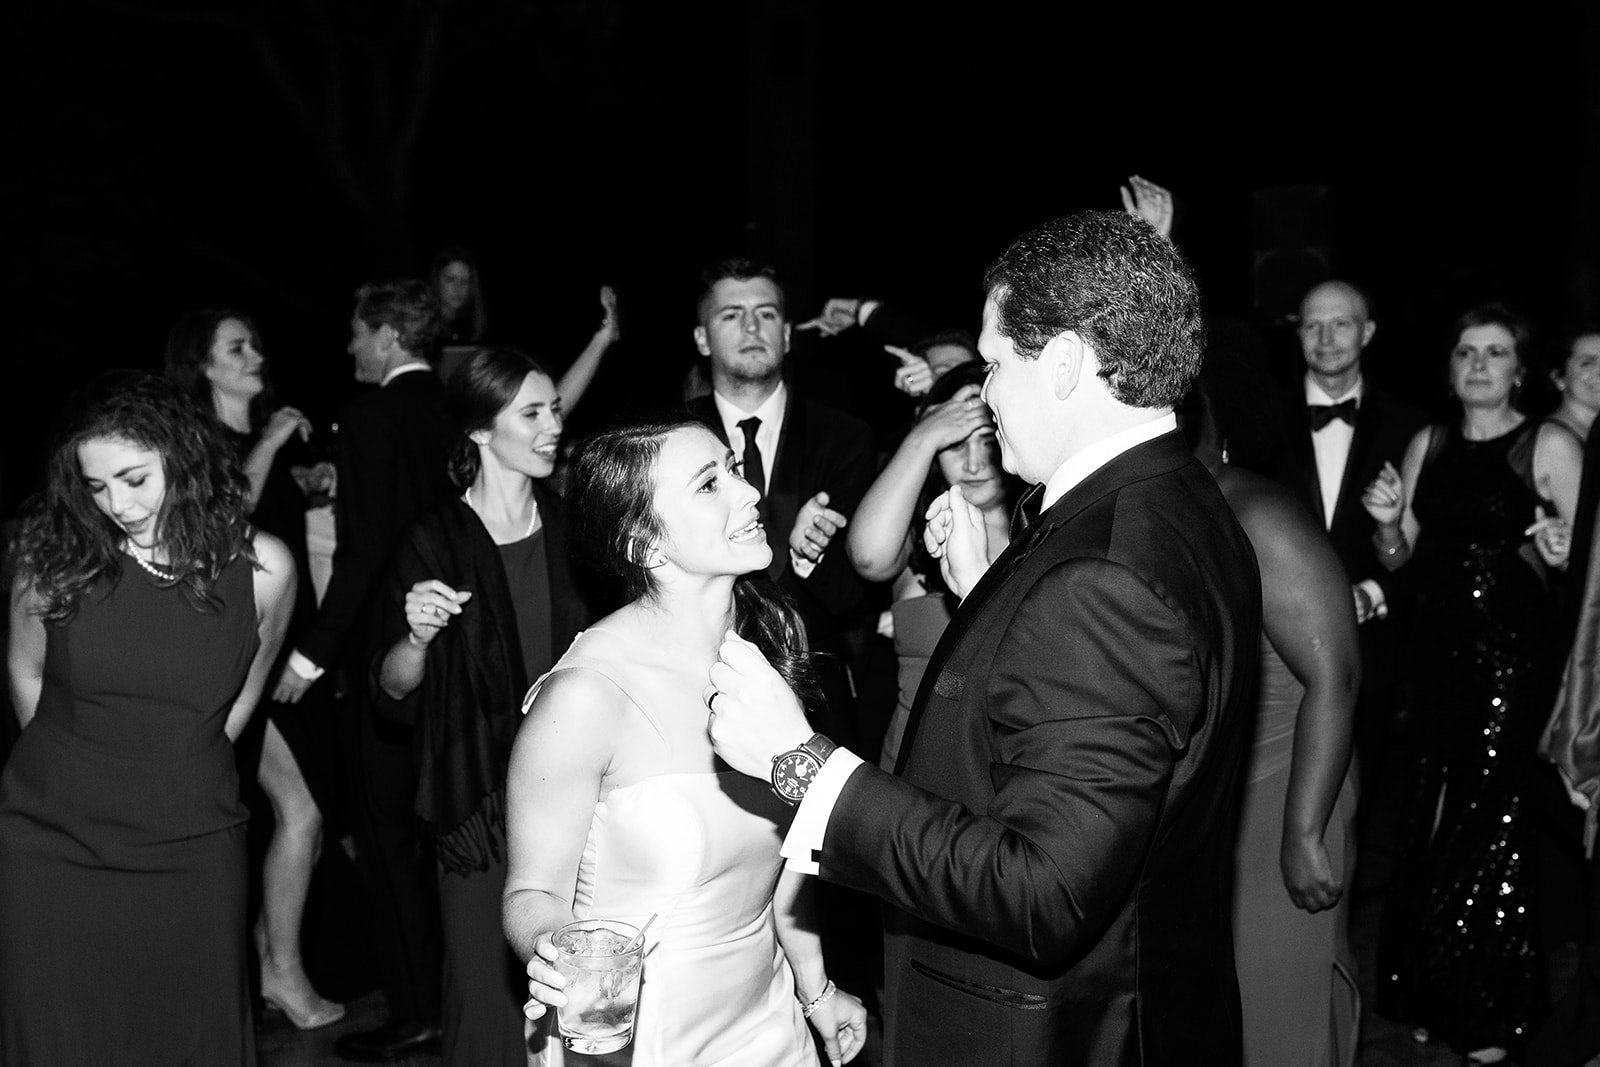 exmoor country club wedding_058.jpg